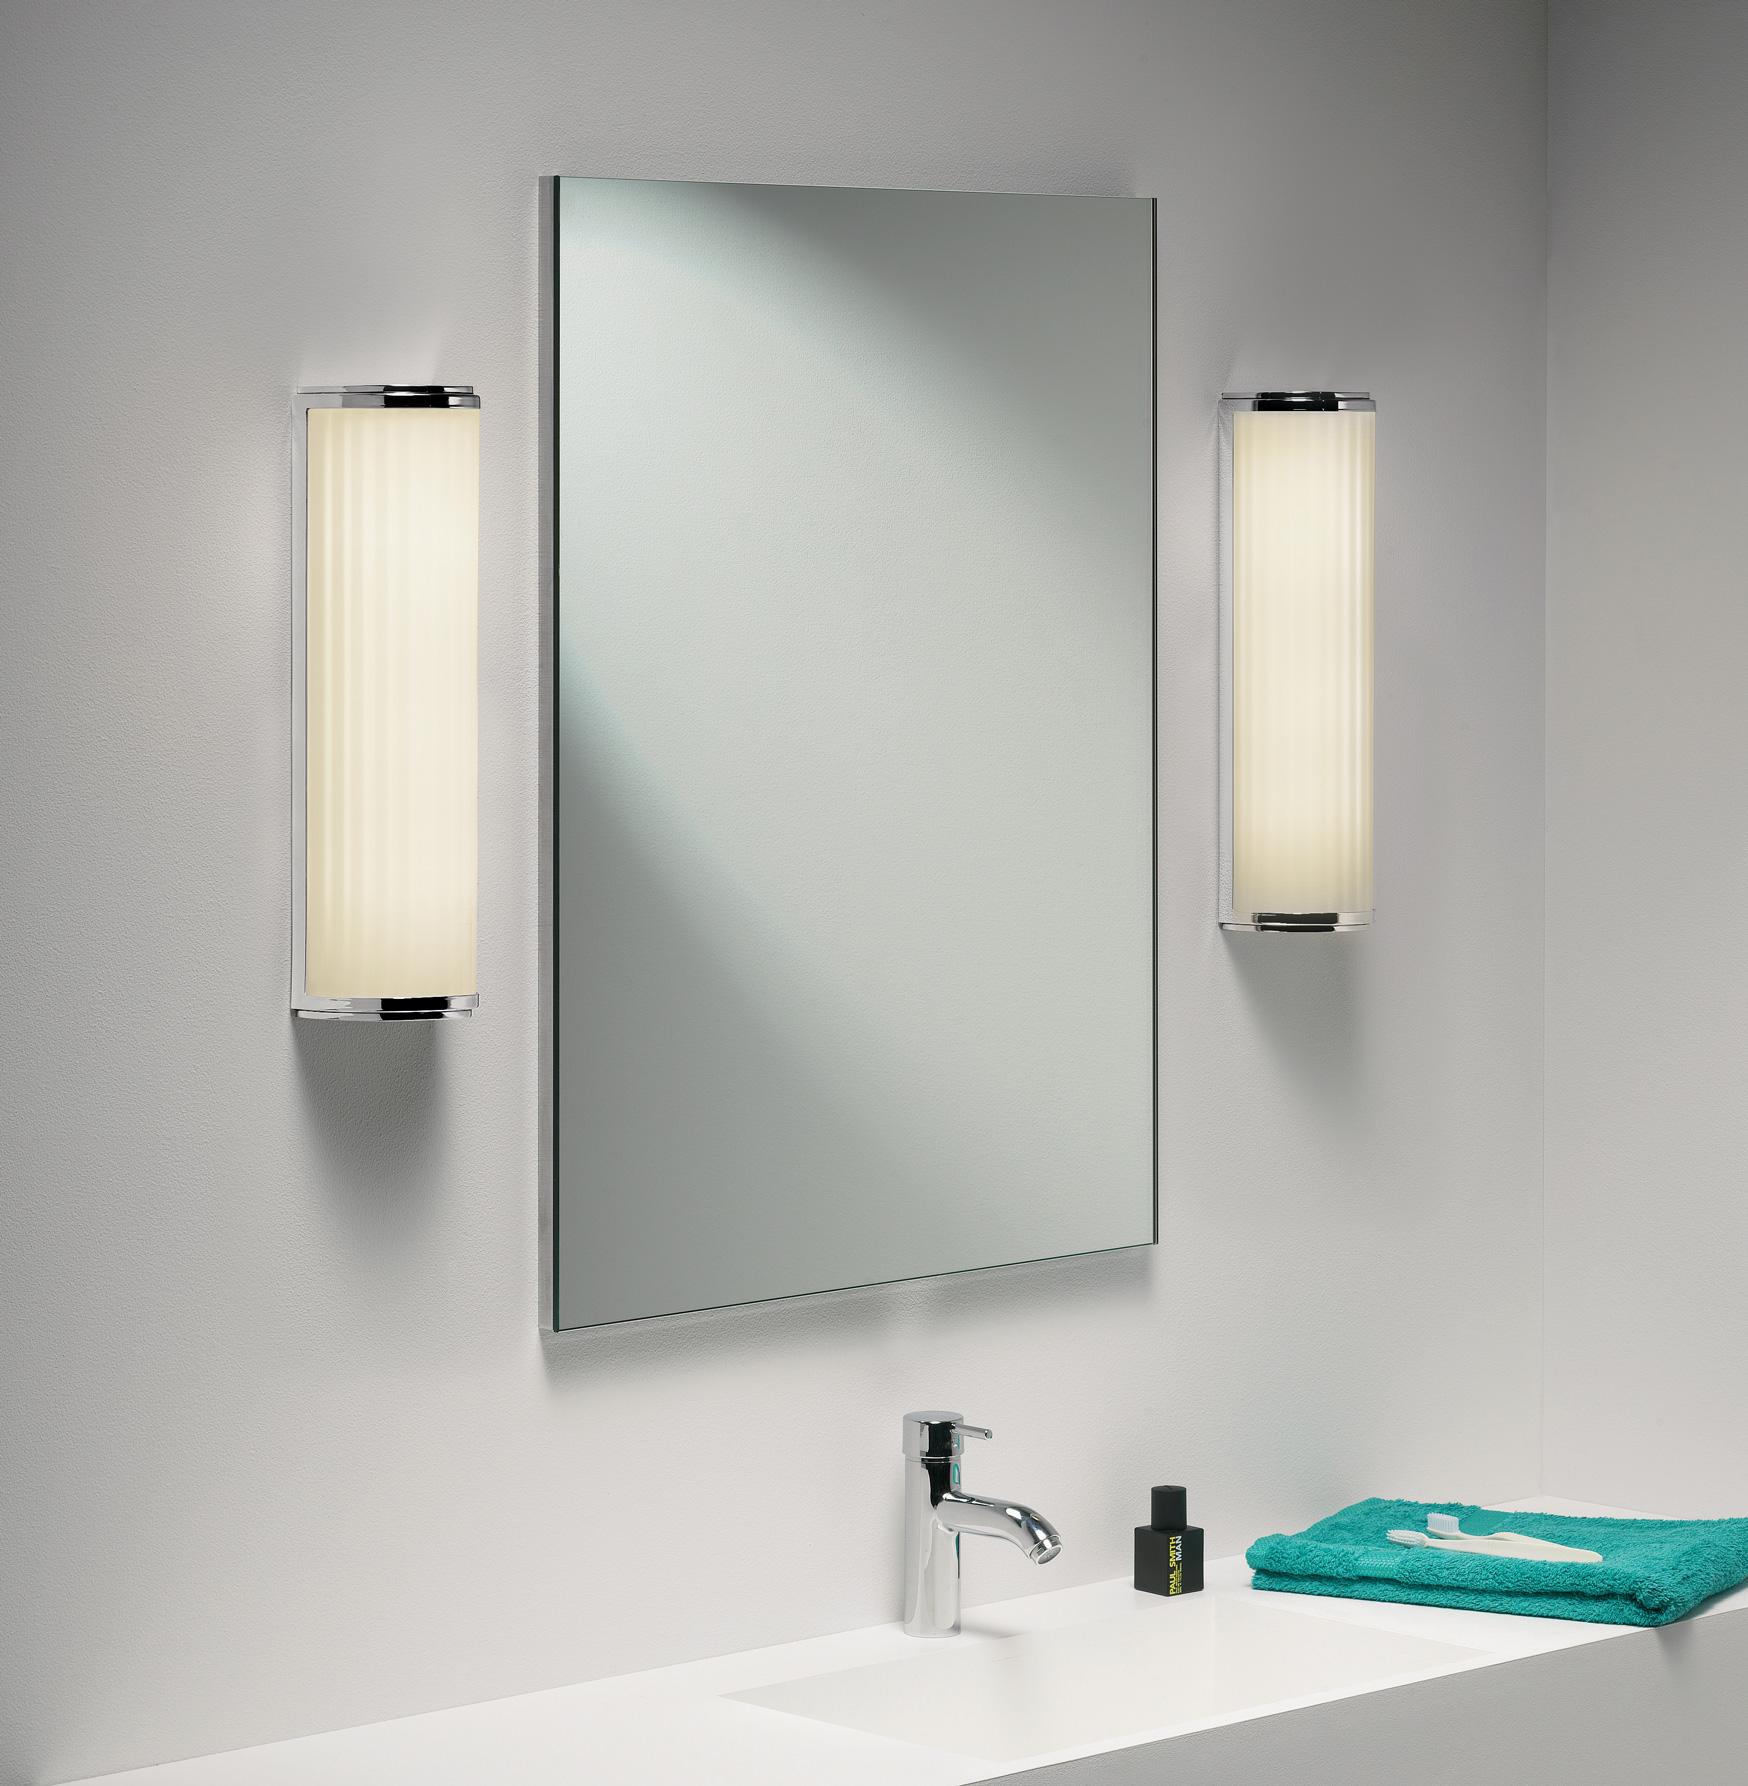 Sentinel Monza Plus 400 0915 Bathroom Wall Light Chrome Gl 1 X 24w 2g11 Ip44